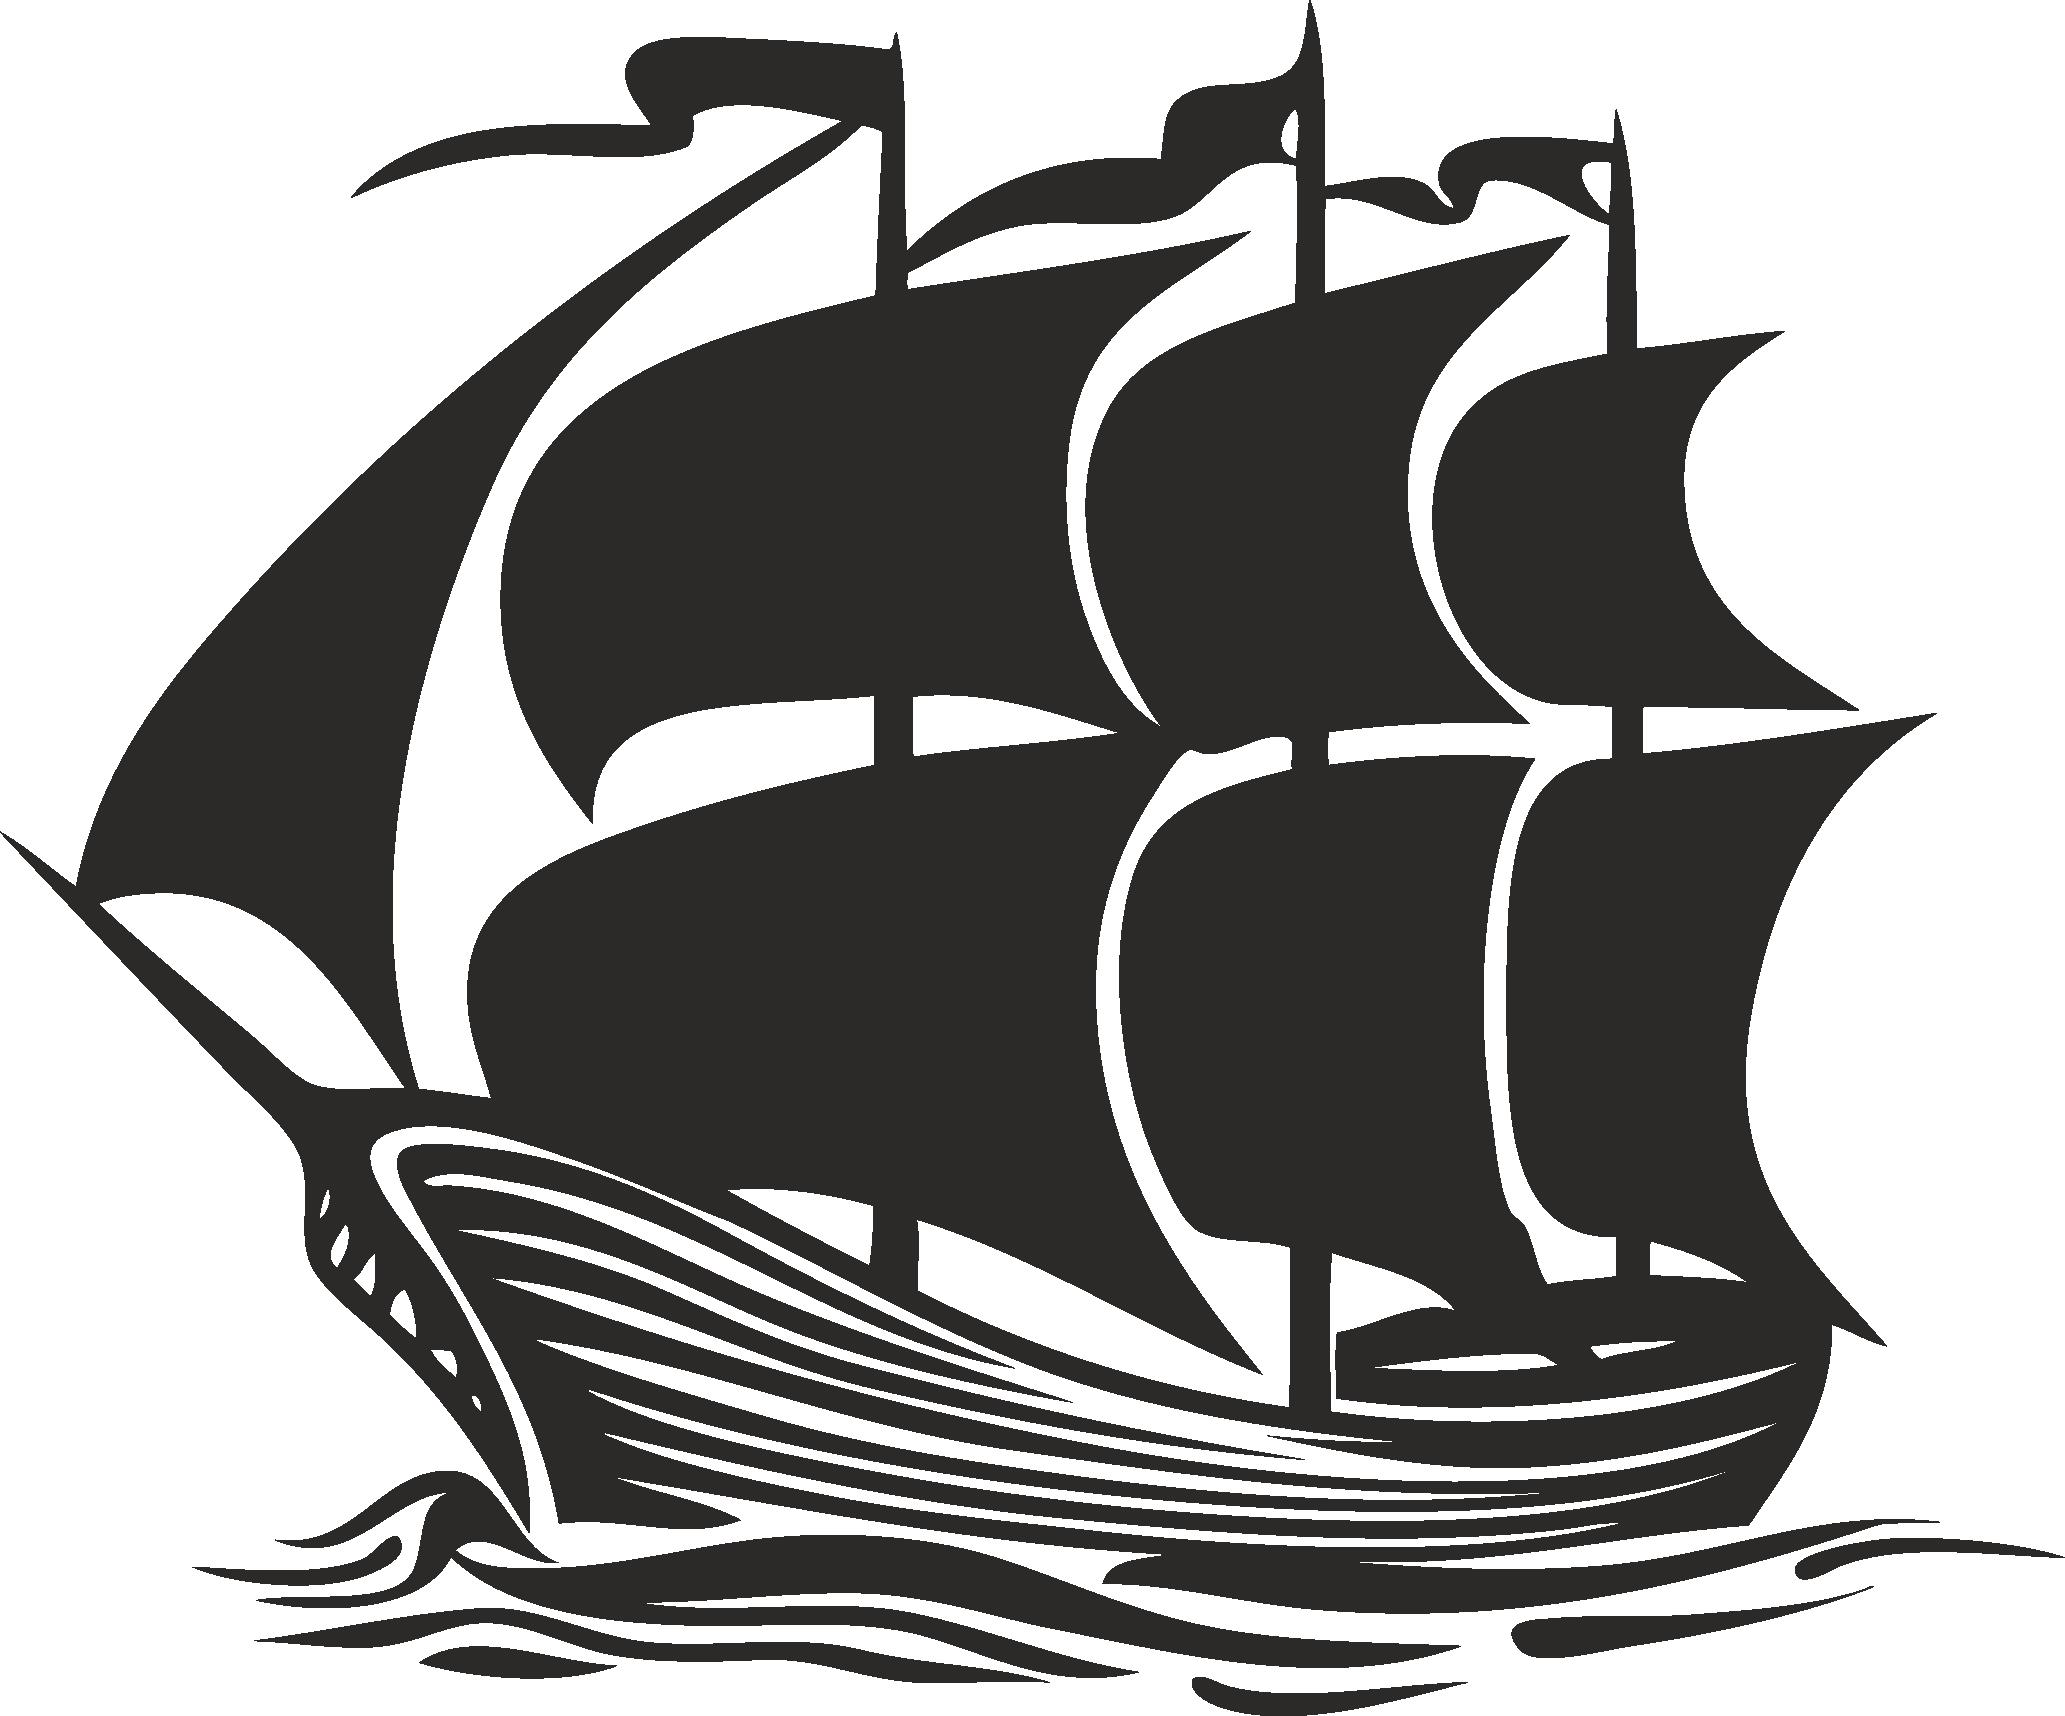 Sailboat Beautiful Silhouettes Of Sailing Ships 06 Free DXF File